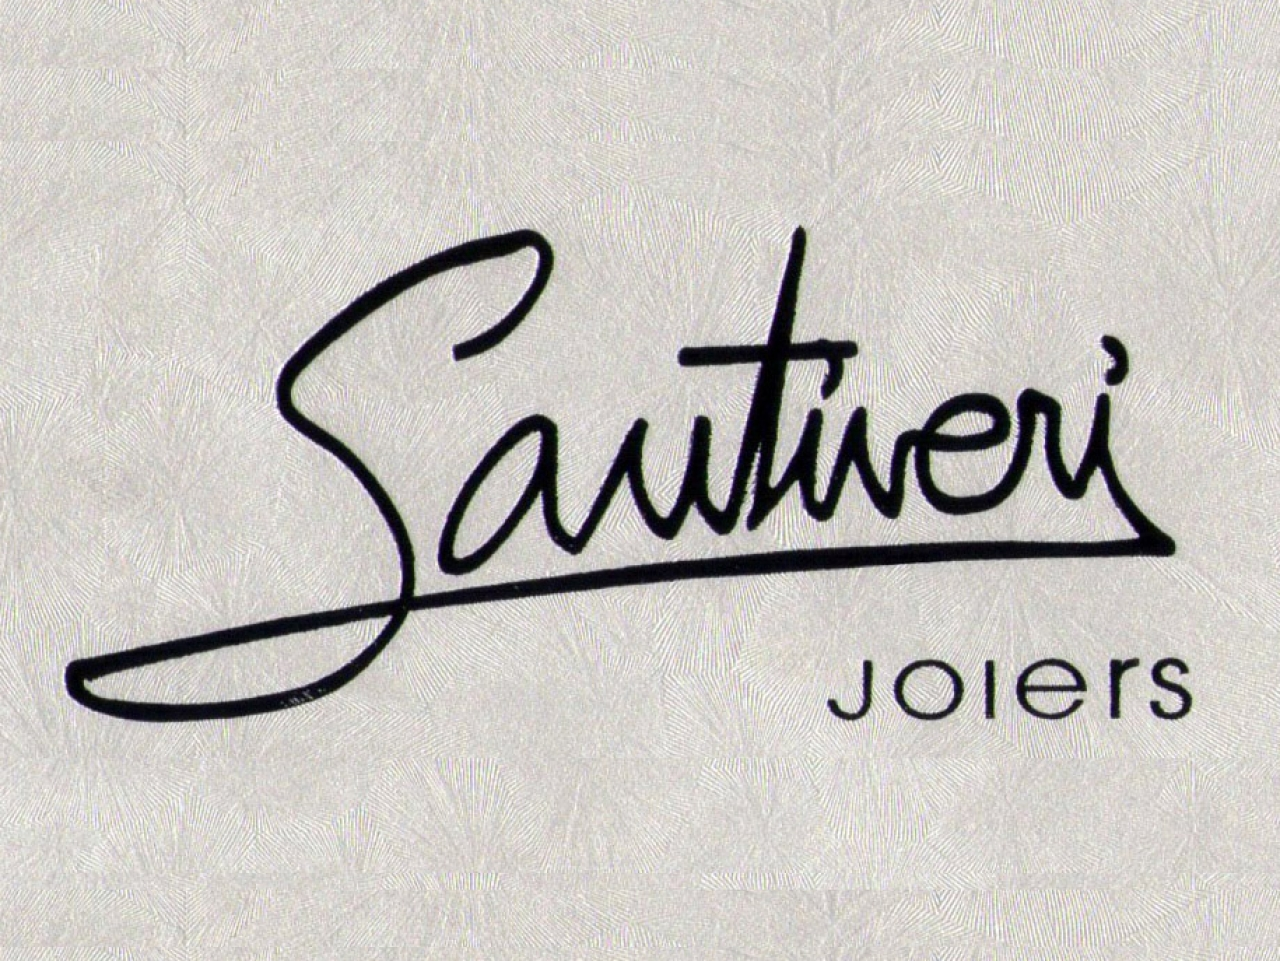 SantiveriJoiers